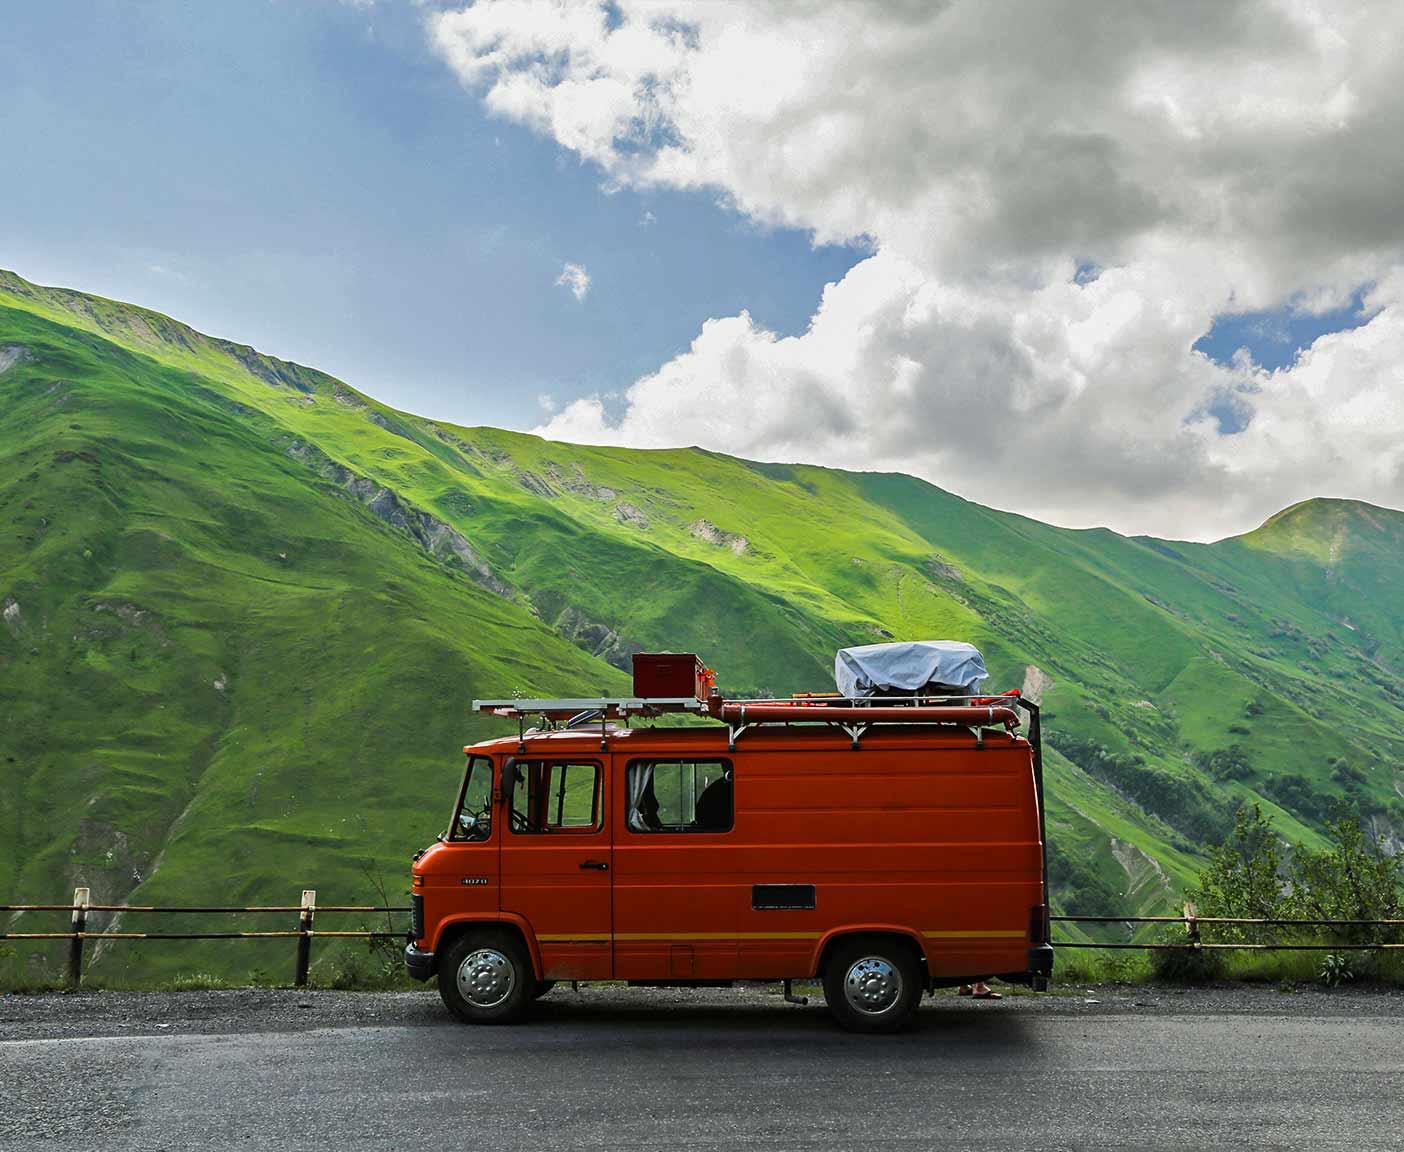 georgien-wohnmobil-erfahrungsbericht-camping-urlaub-preisniveau-tiflis-vanlife-military-road3